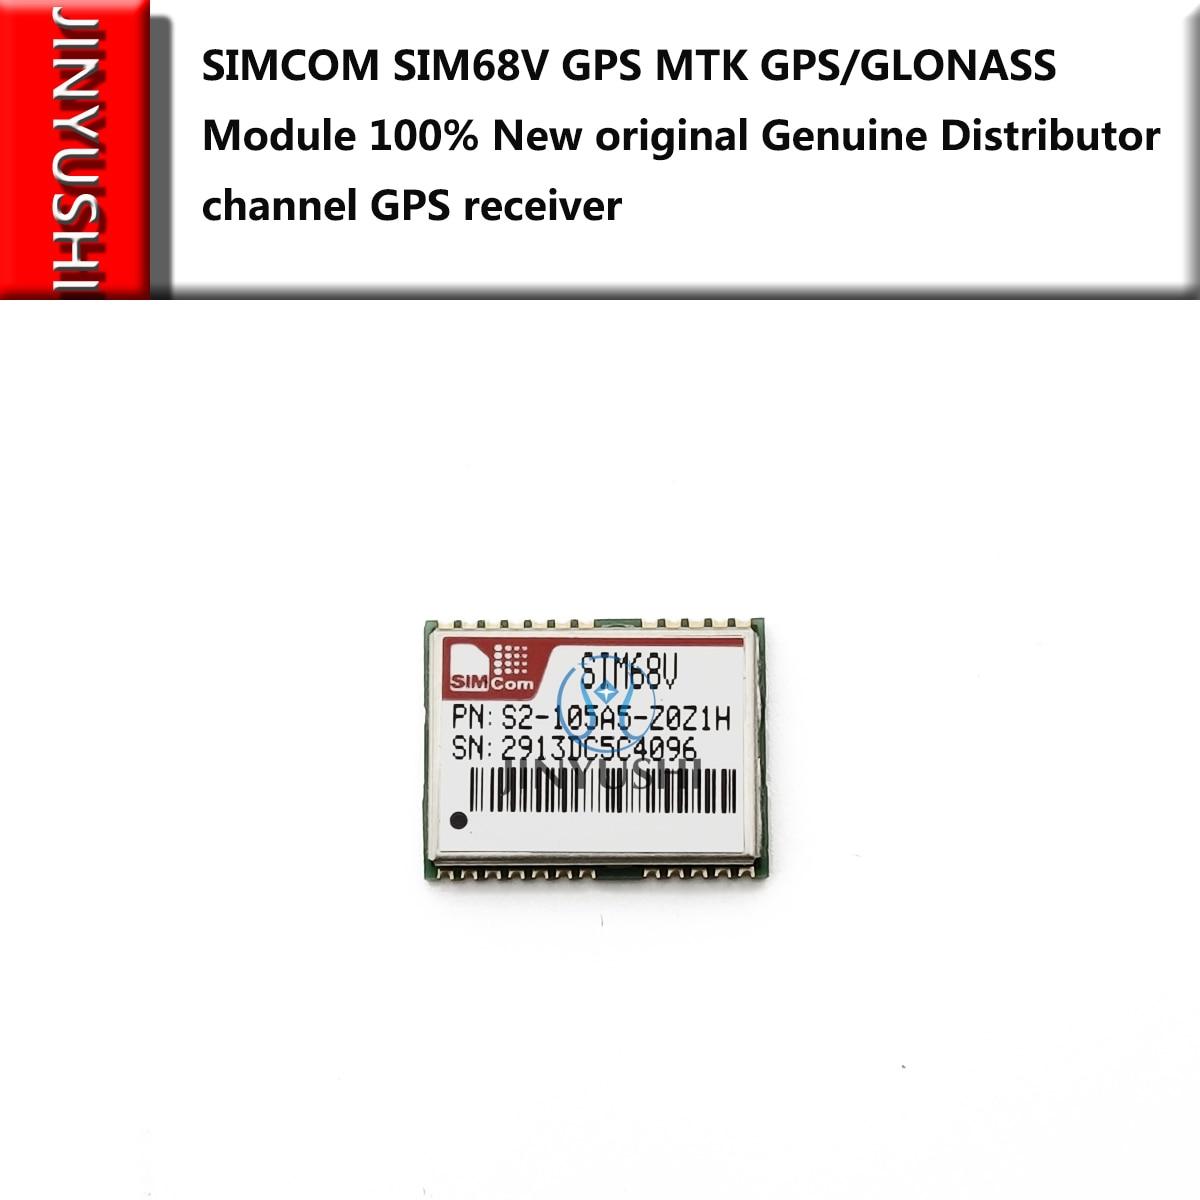 2pcs  SIM68V SIMCOM GPS MTK GPS/GLONASS Module 100% New Original Genuine Distributor Channel GPS Receiver Free Shipping In Stock